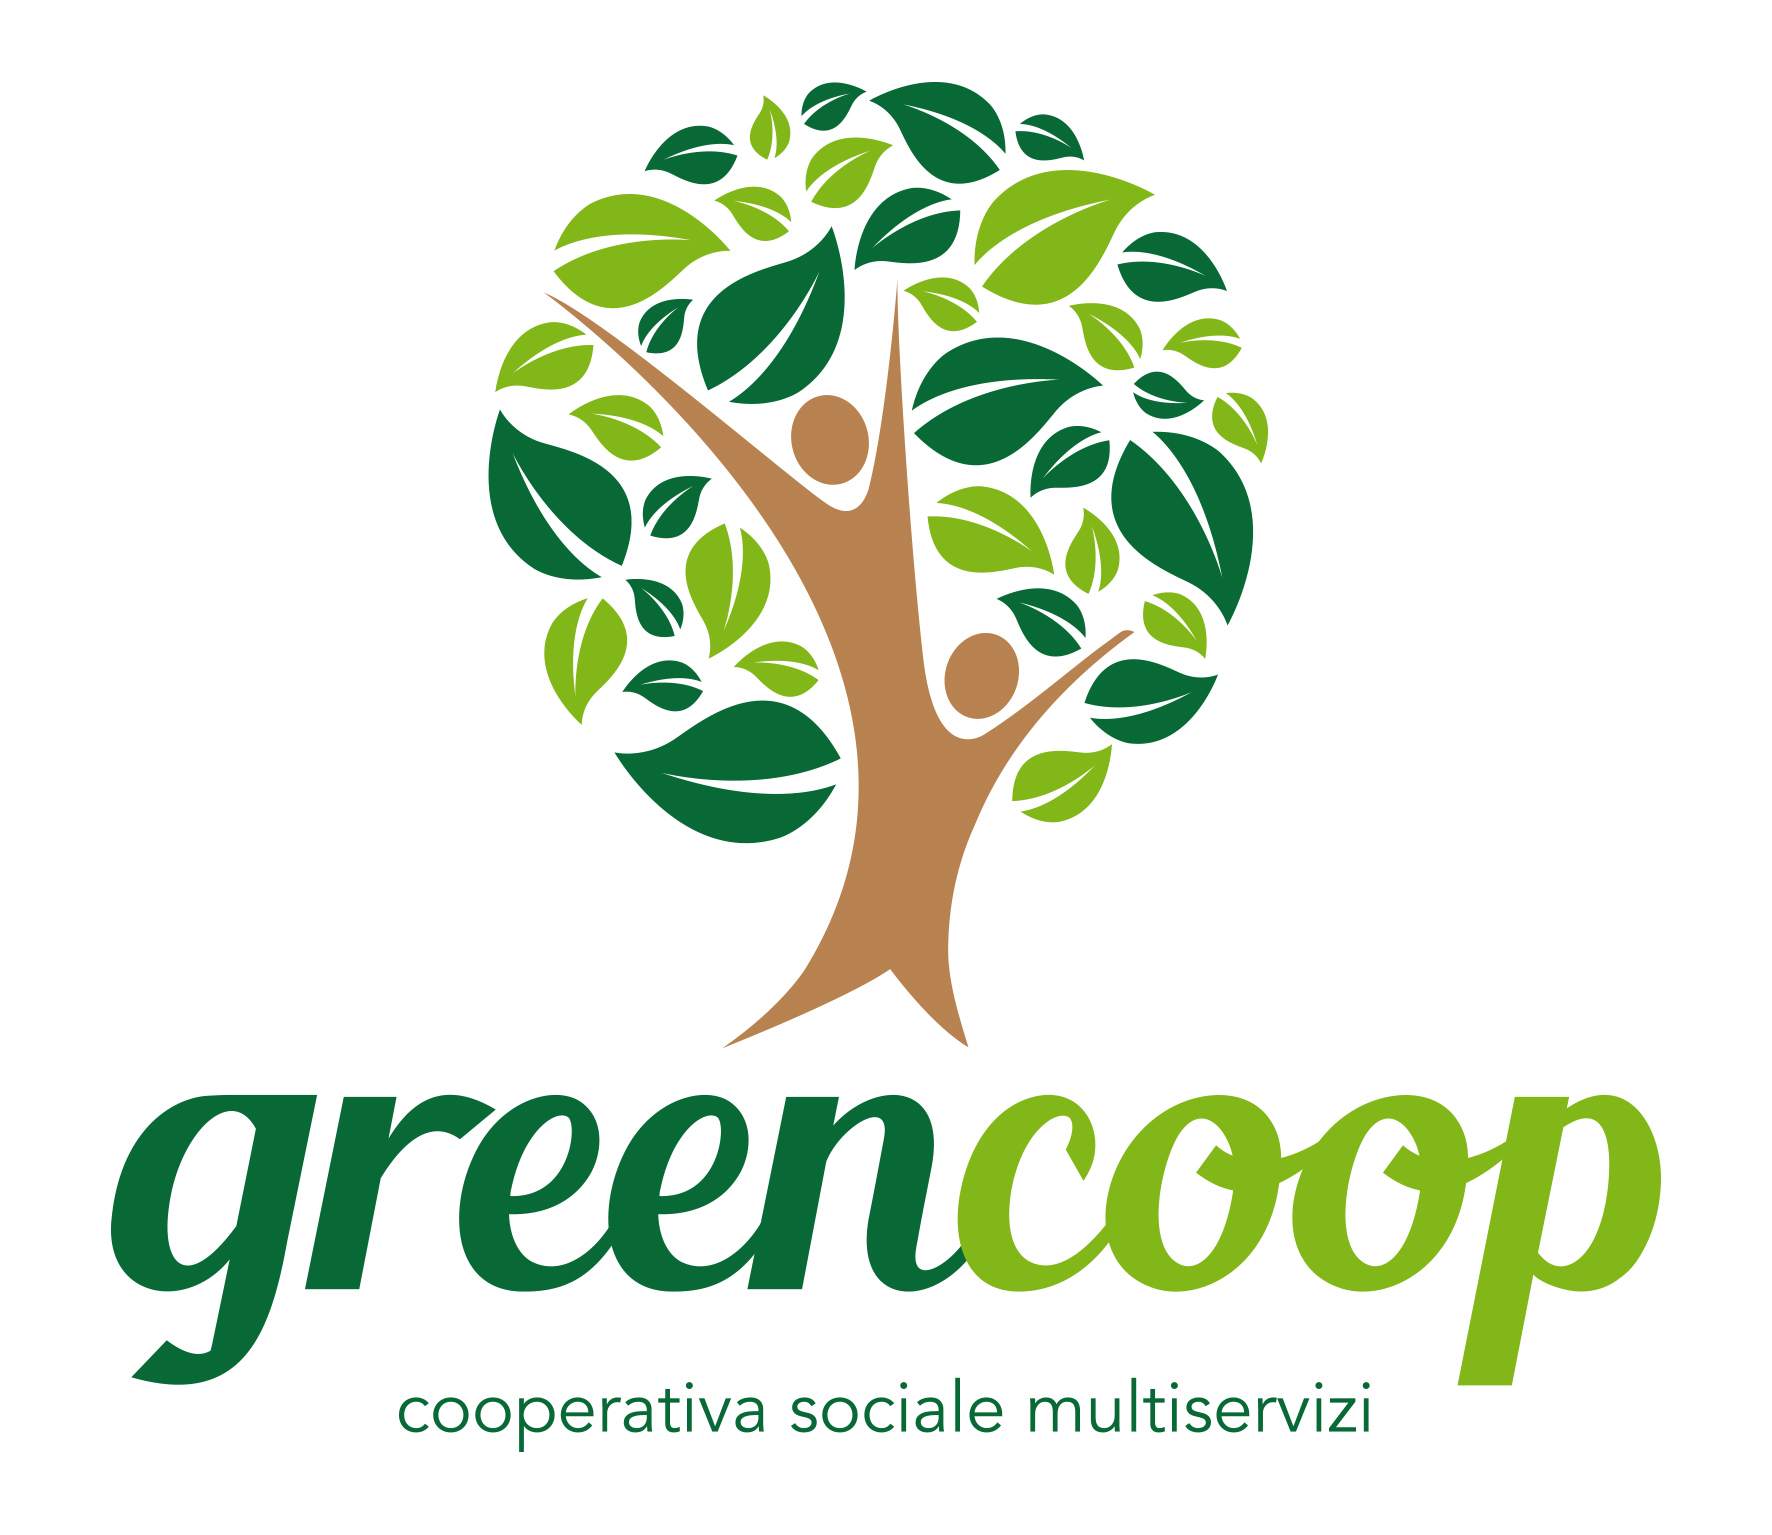 GreenCoop